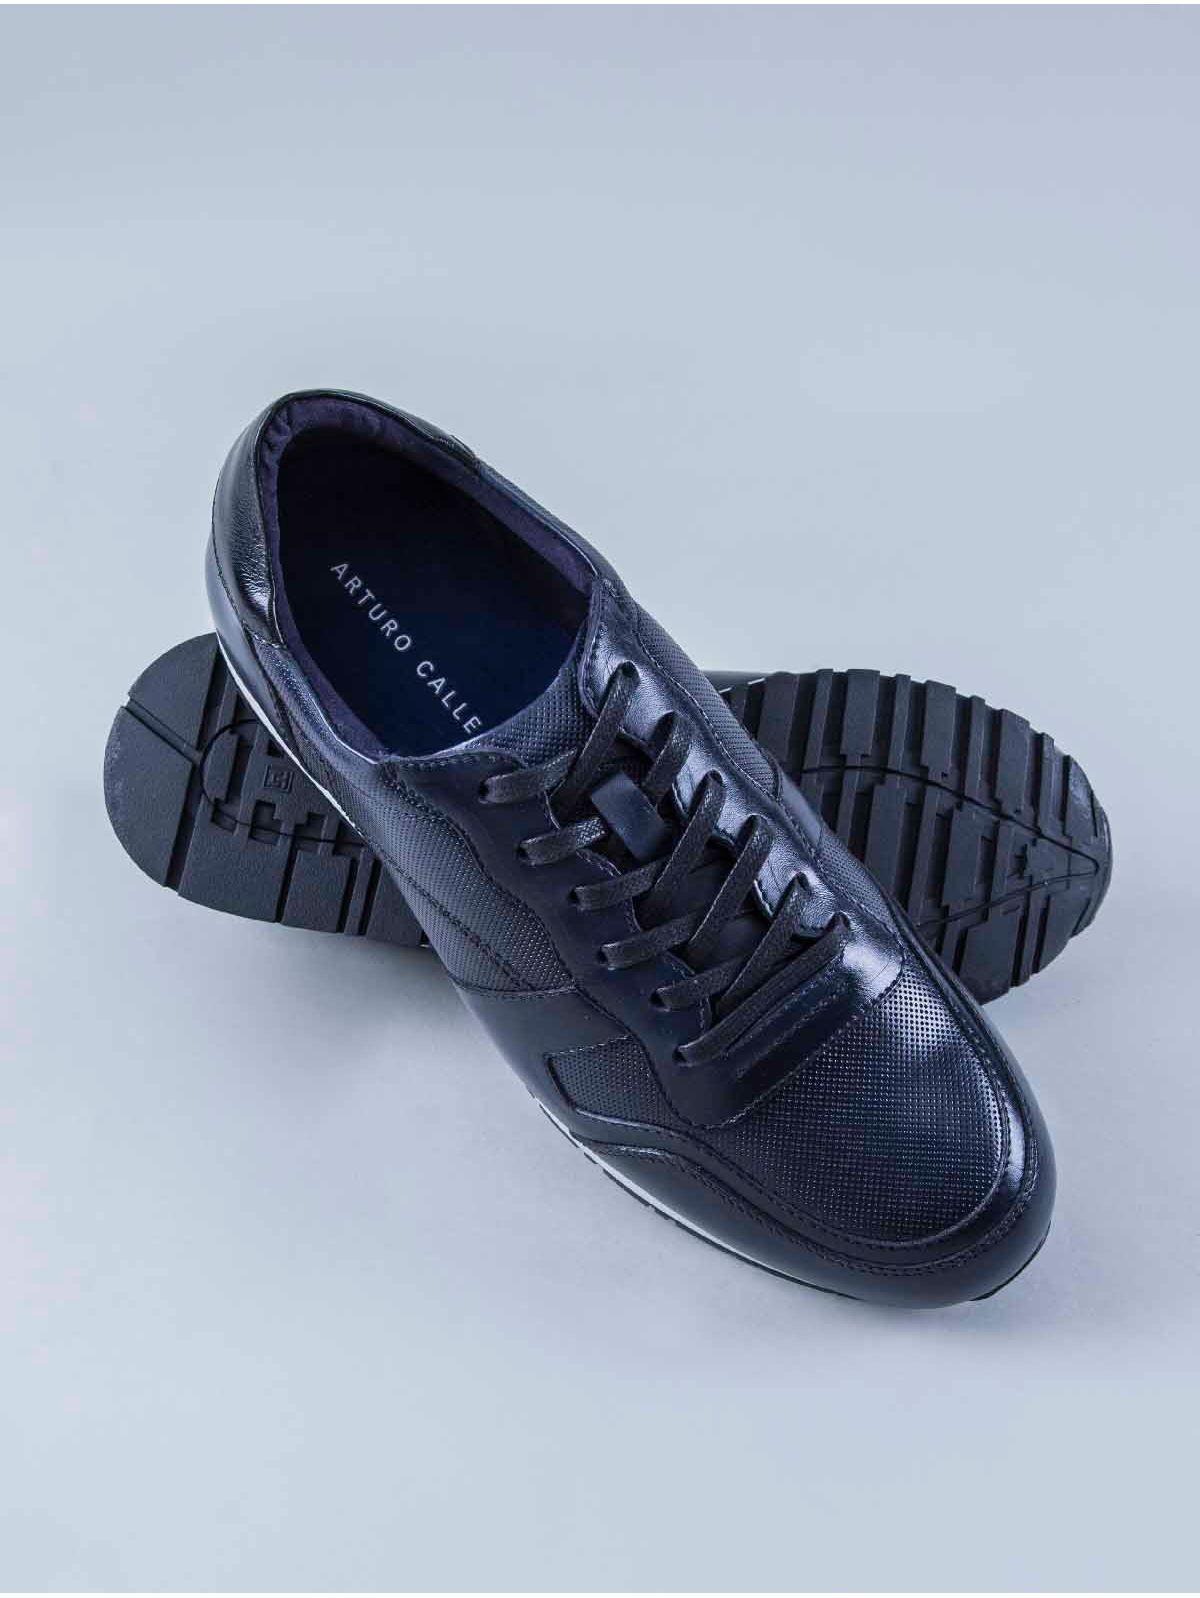 a2a89c24 Zapato Tipo Sneaker Suela en Contraste con Cordones 81811 - Arturo Calle